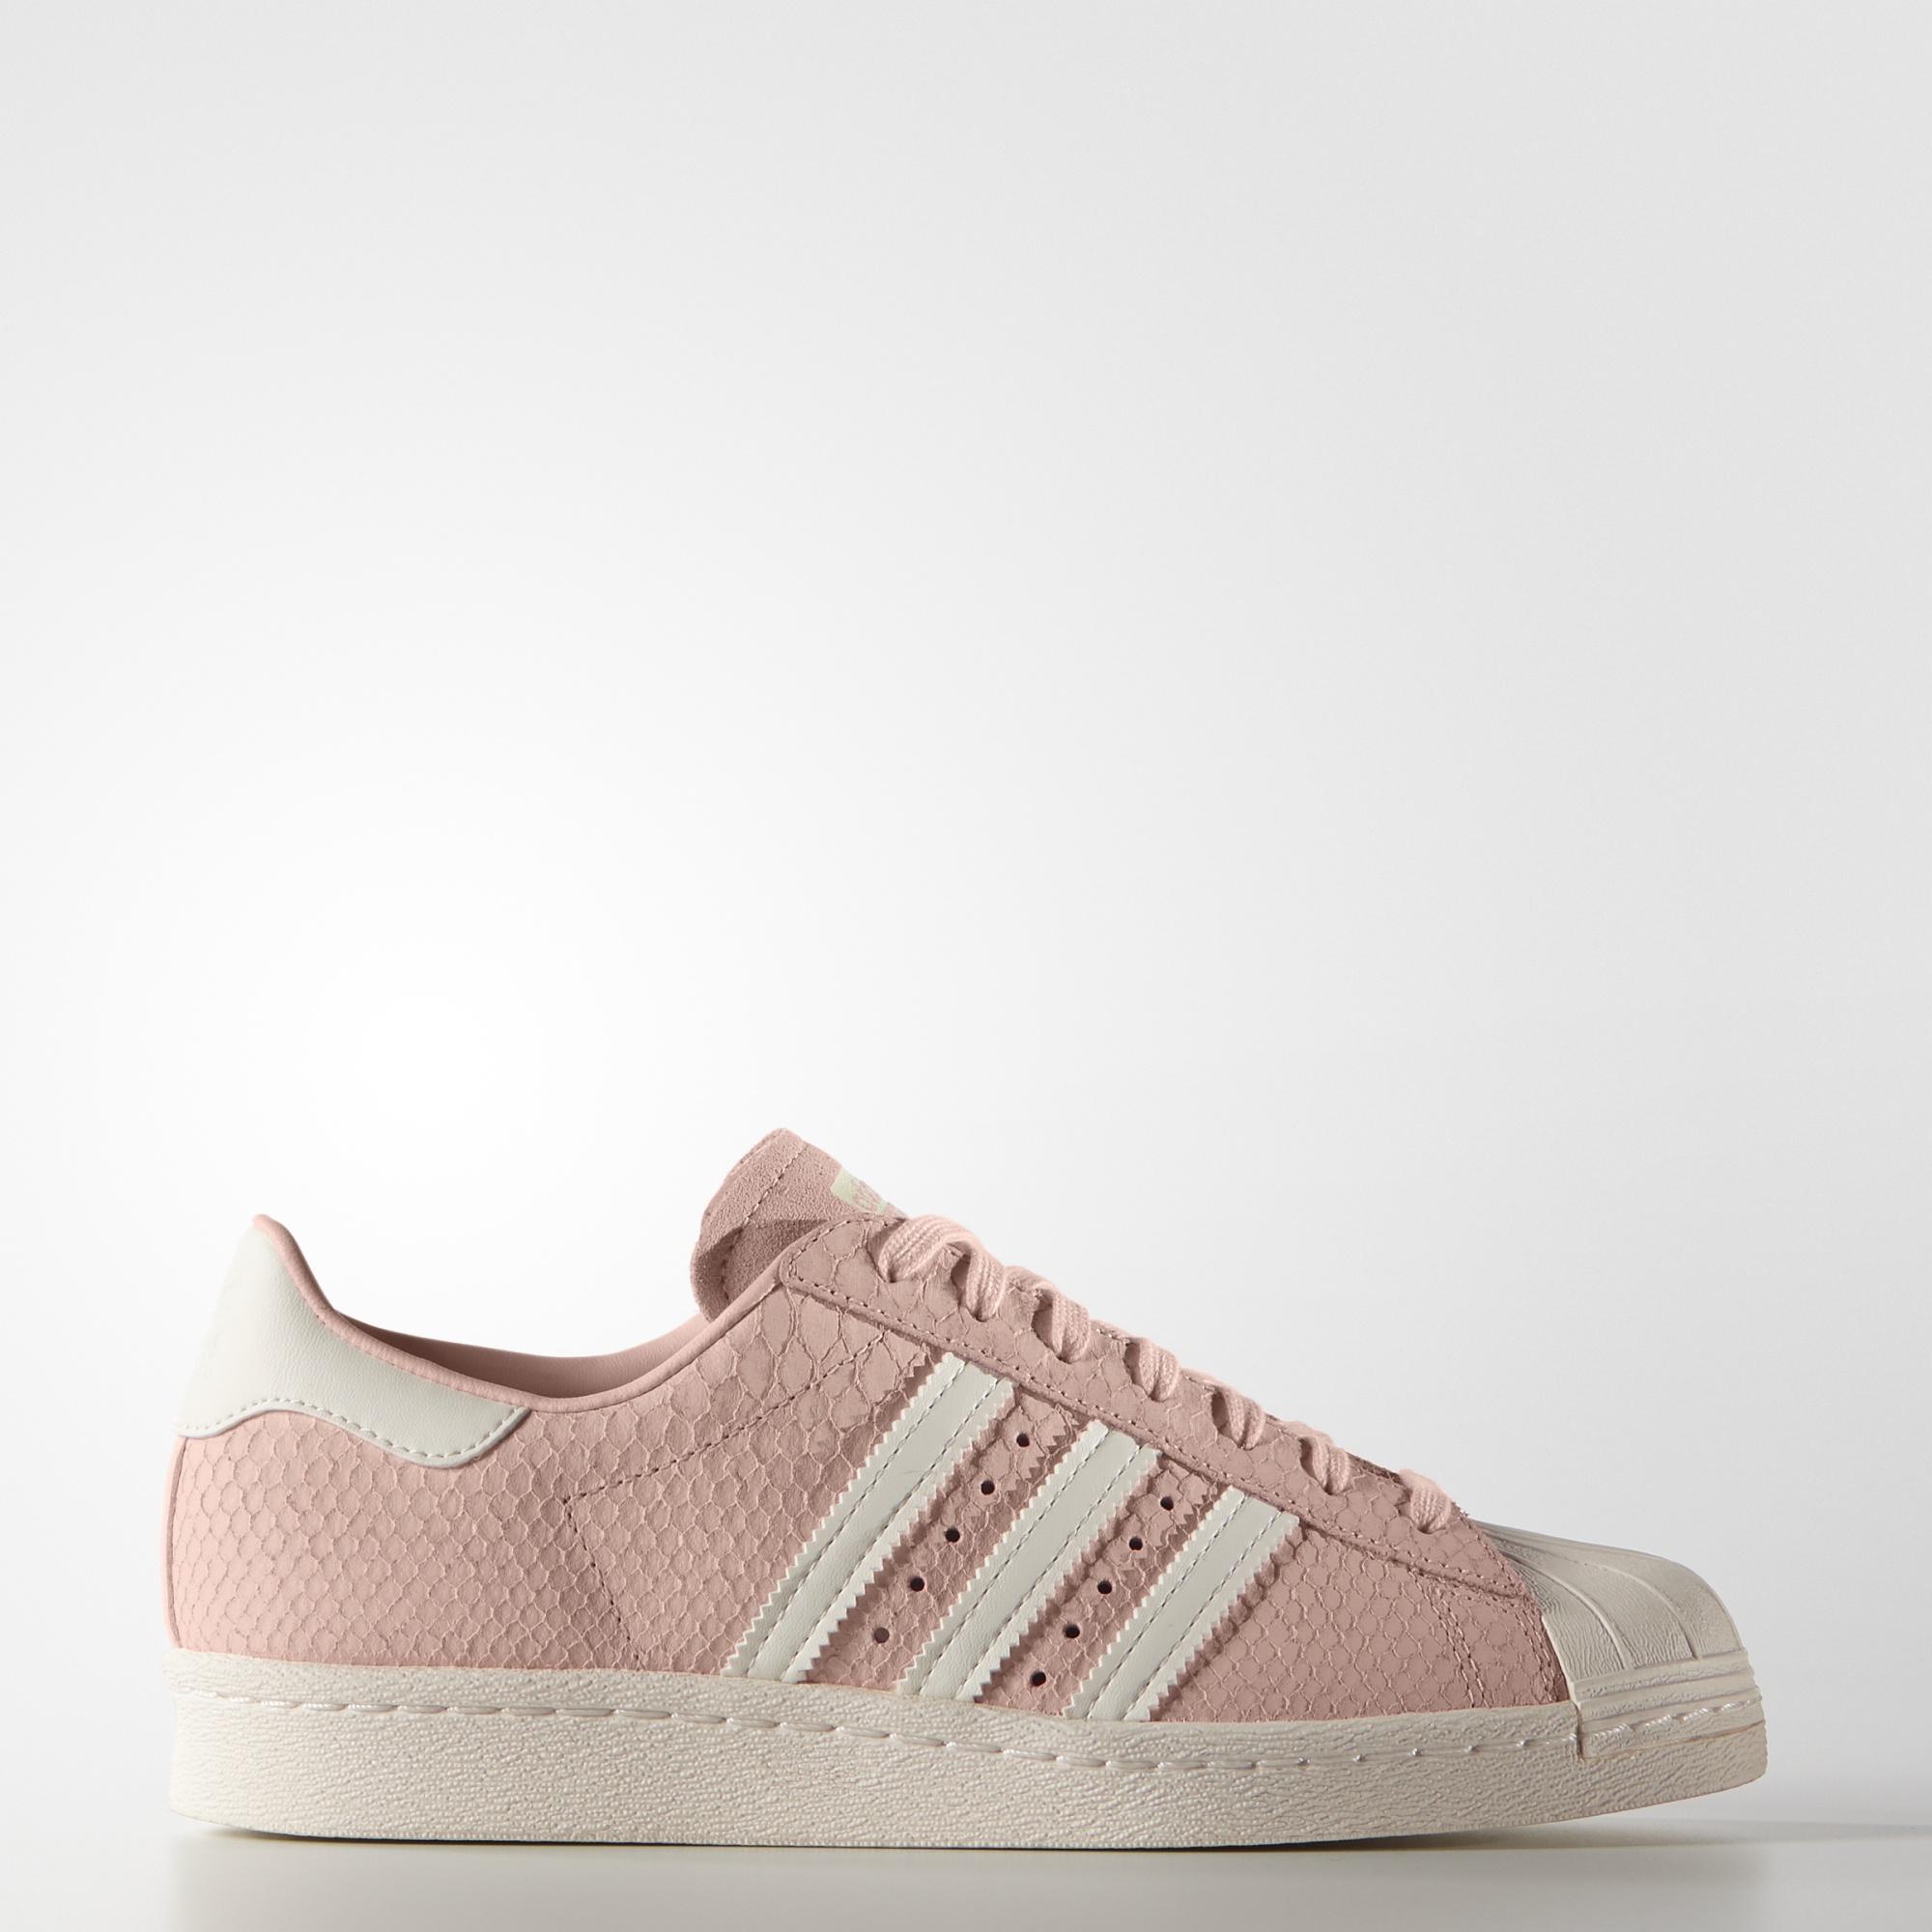 eebd0dbc905 adidas Superstar 80s Schuh - rosa